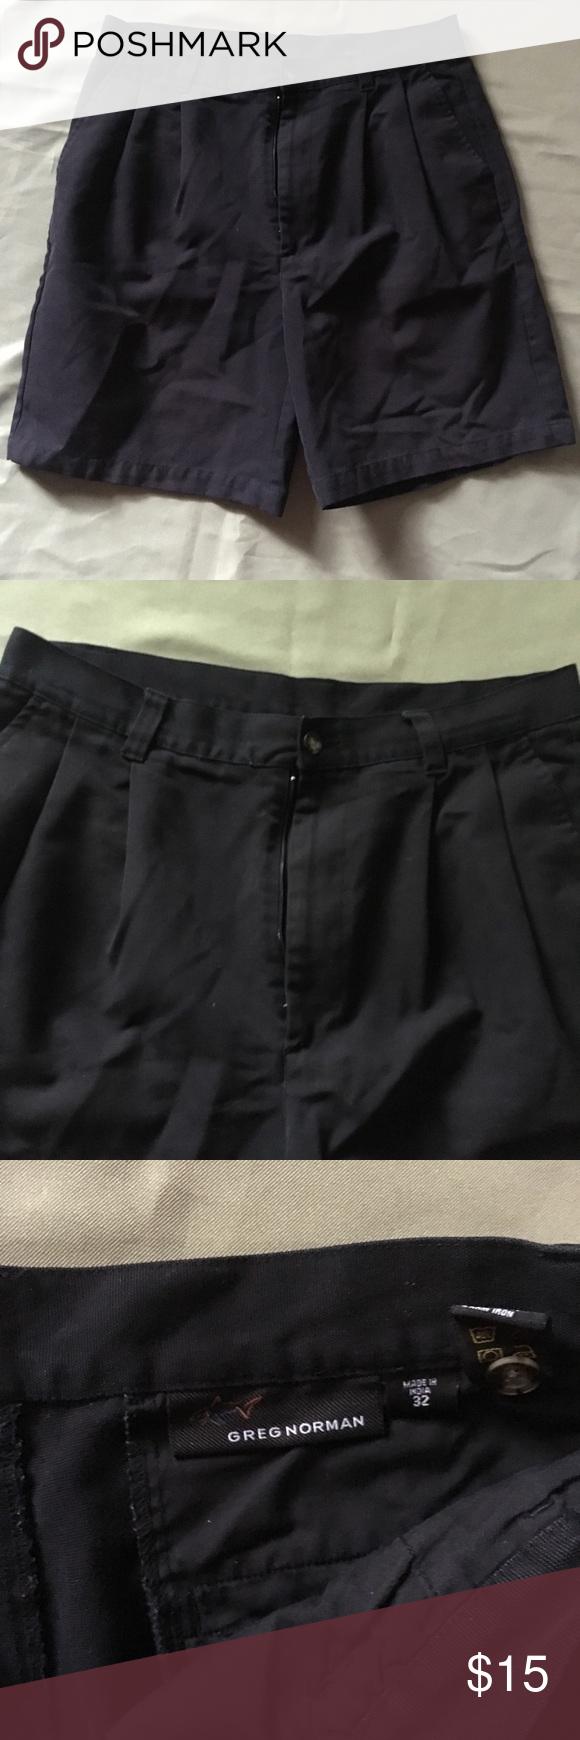 Greg Norman Black Golf Boating Shorts Men S 32 How To Wear Mens Shorts Gym Shorts Womens